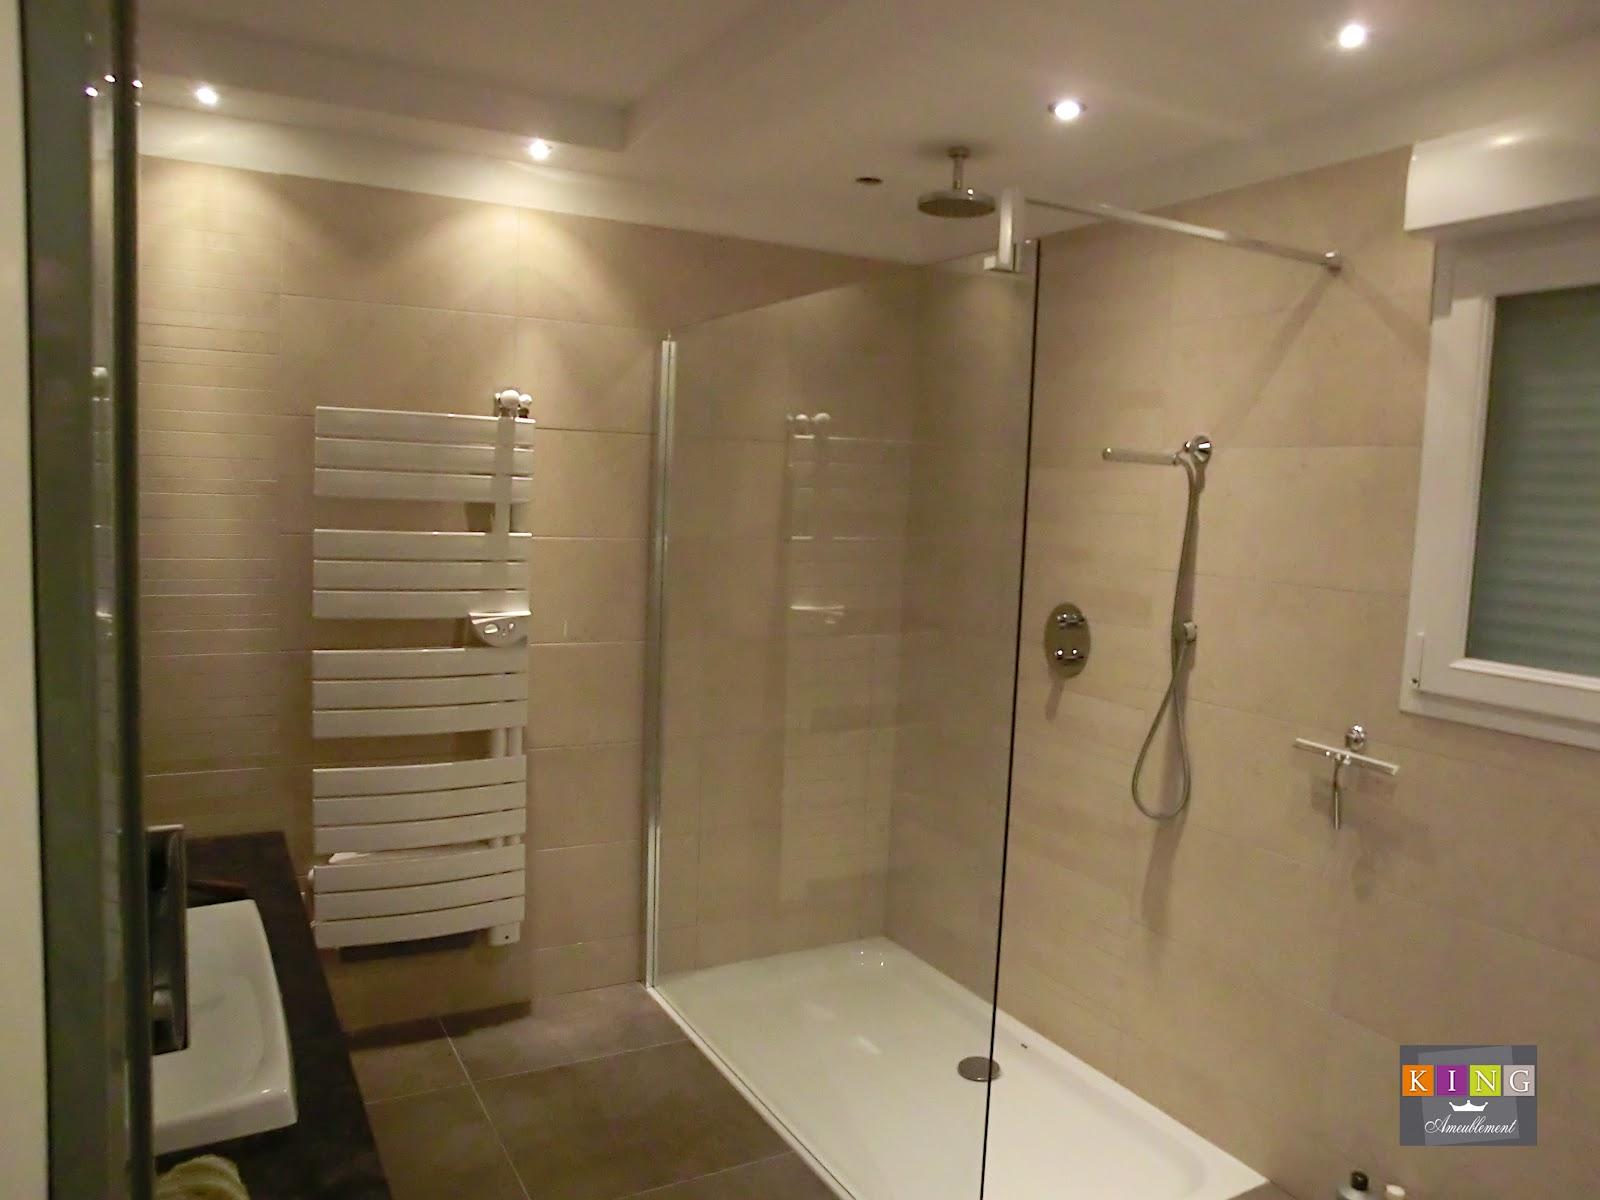 Modele salle de bain moderne mariage de la salle bains for Exemple de salle de bain moderne